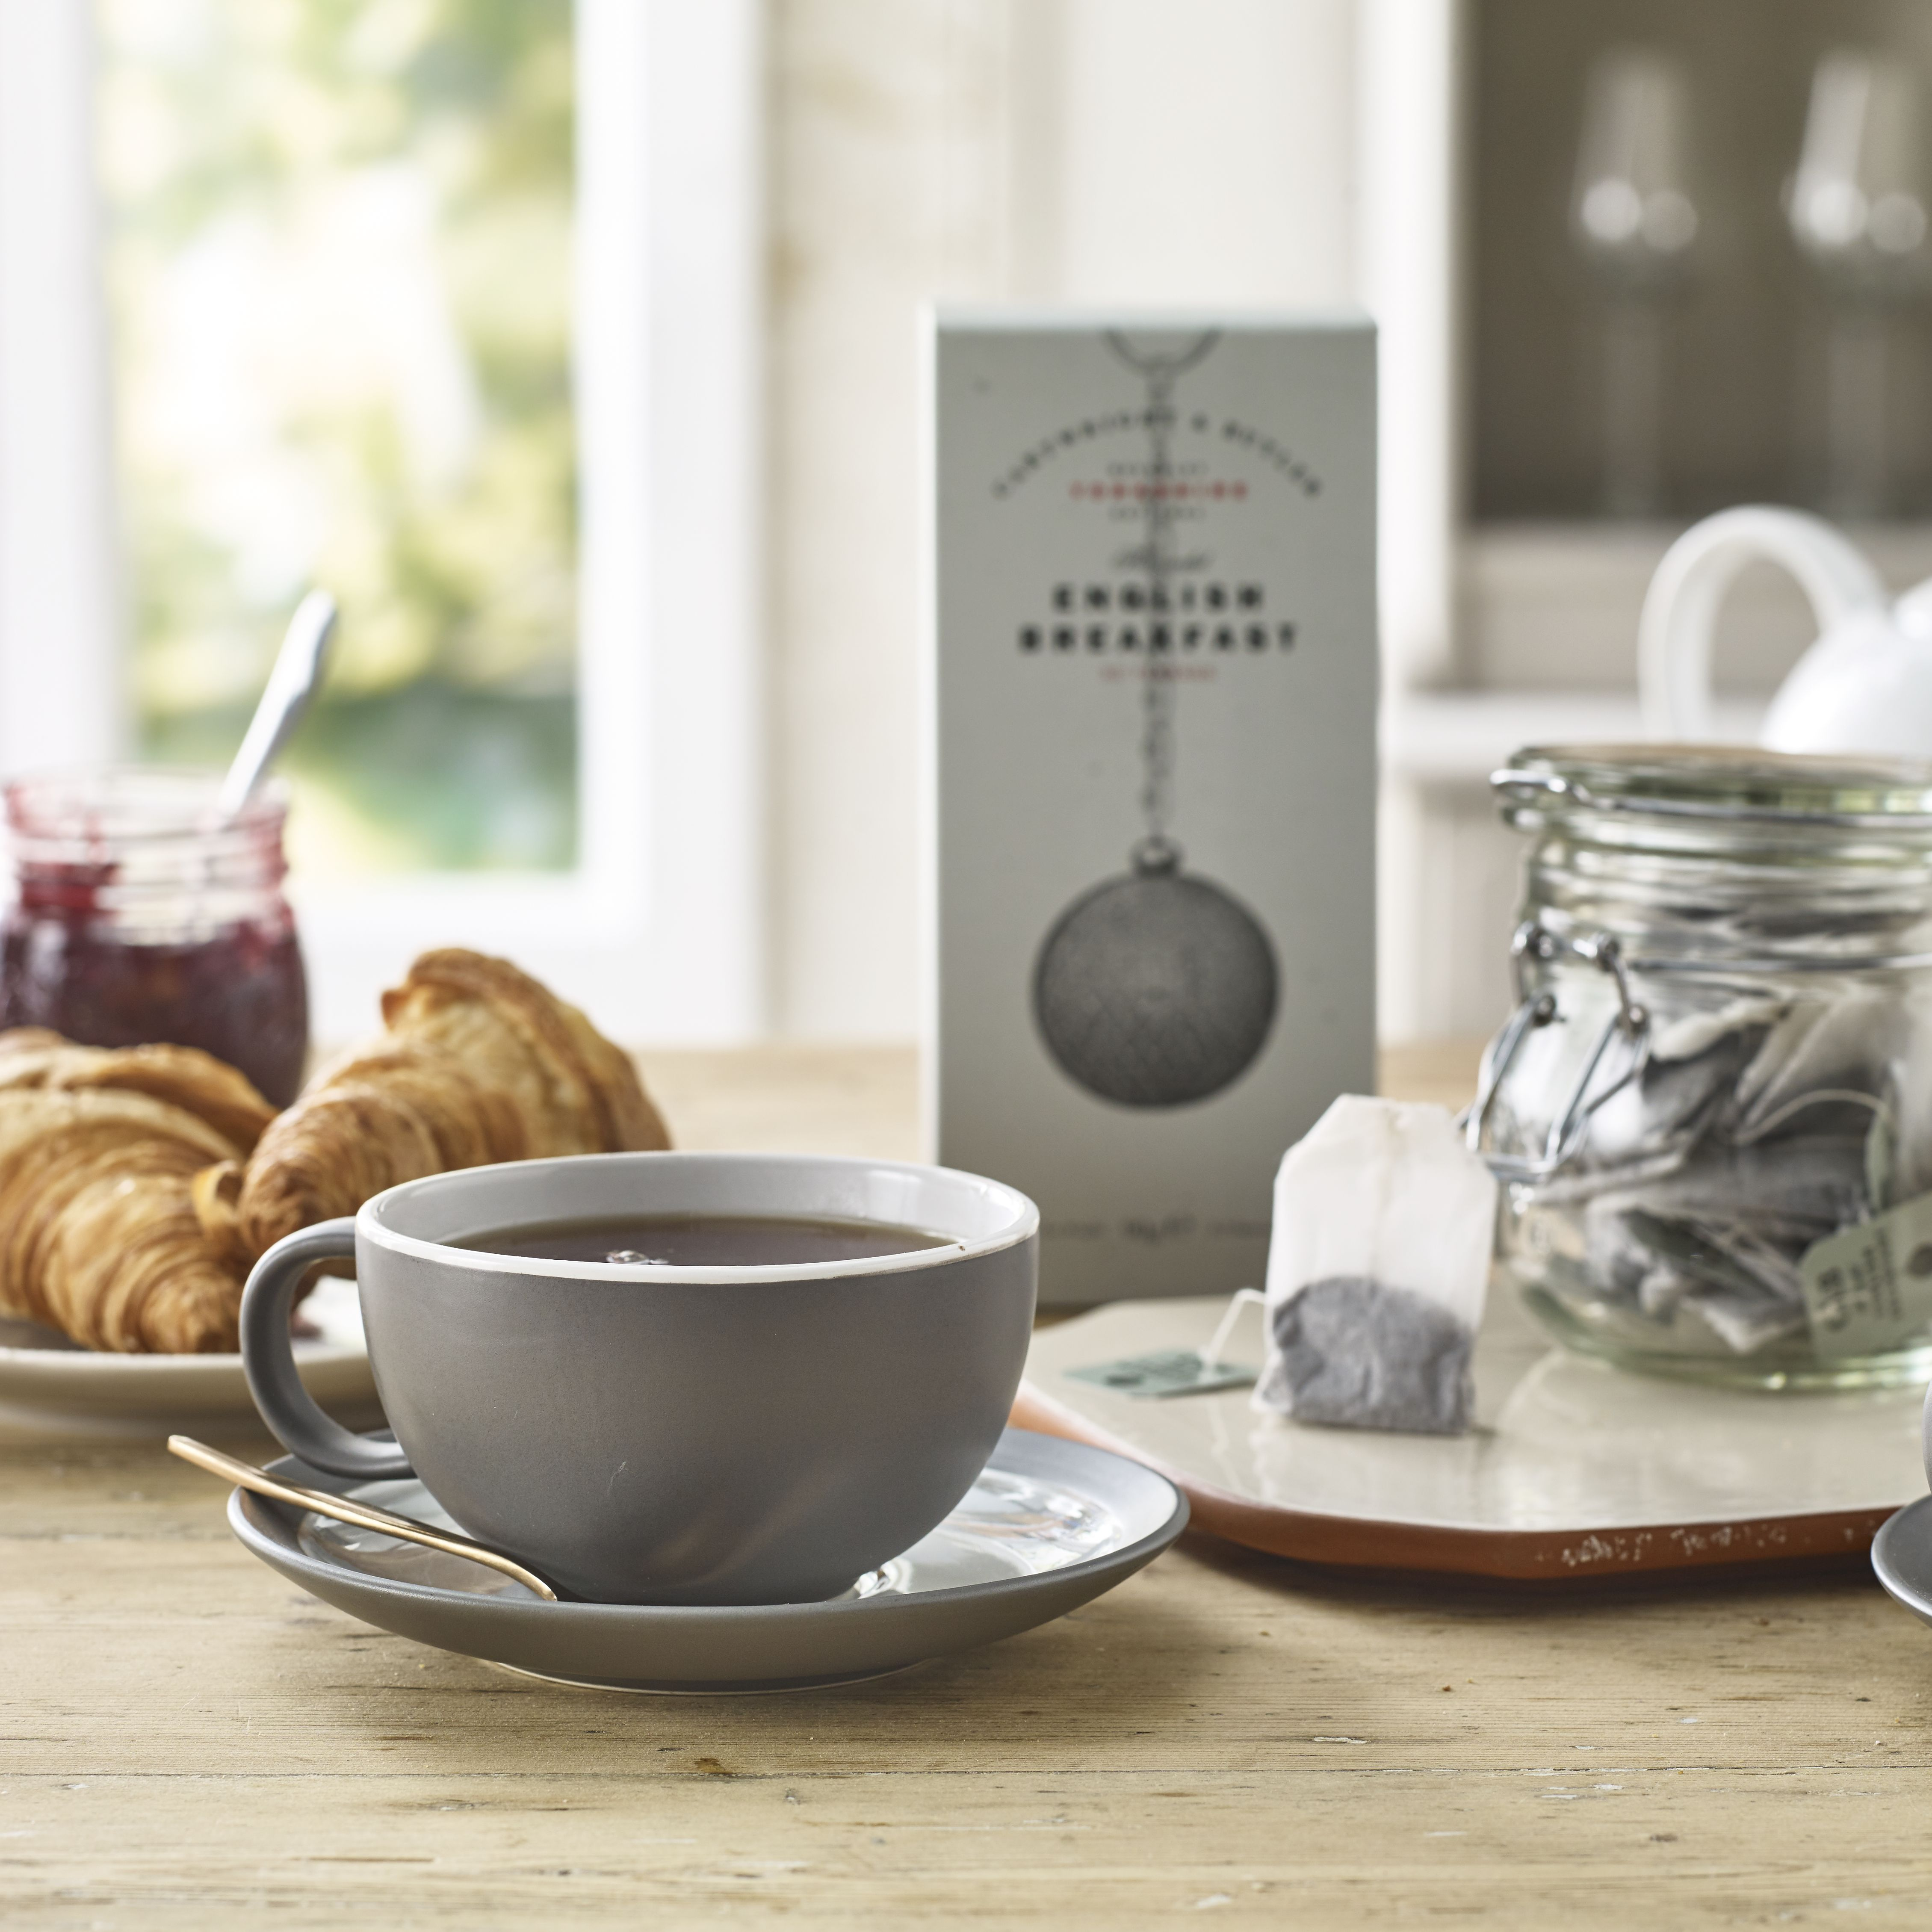 Cartwright & Butler Tea in Carton (English Breakfast), 90g